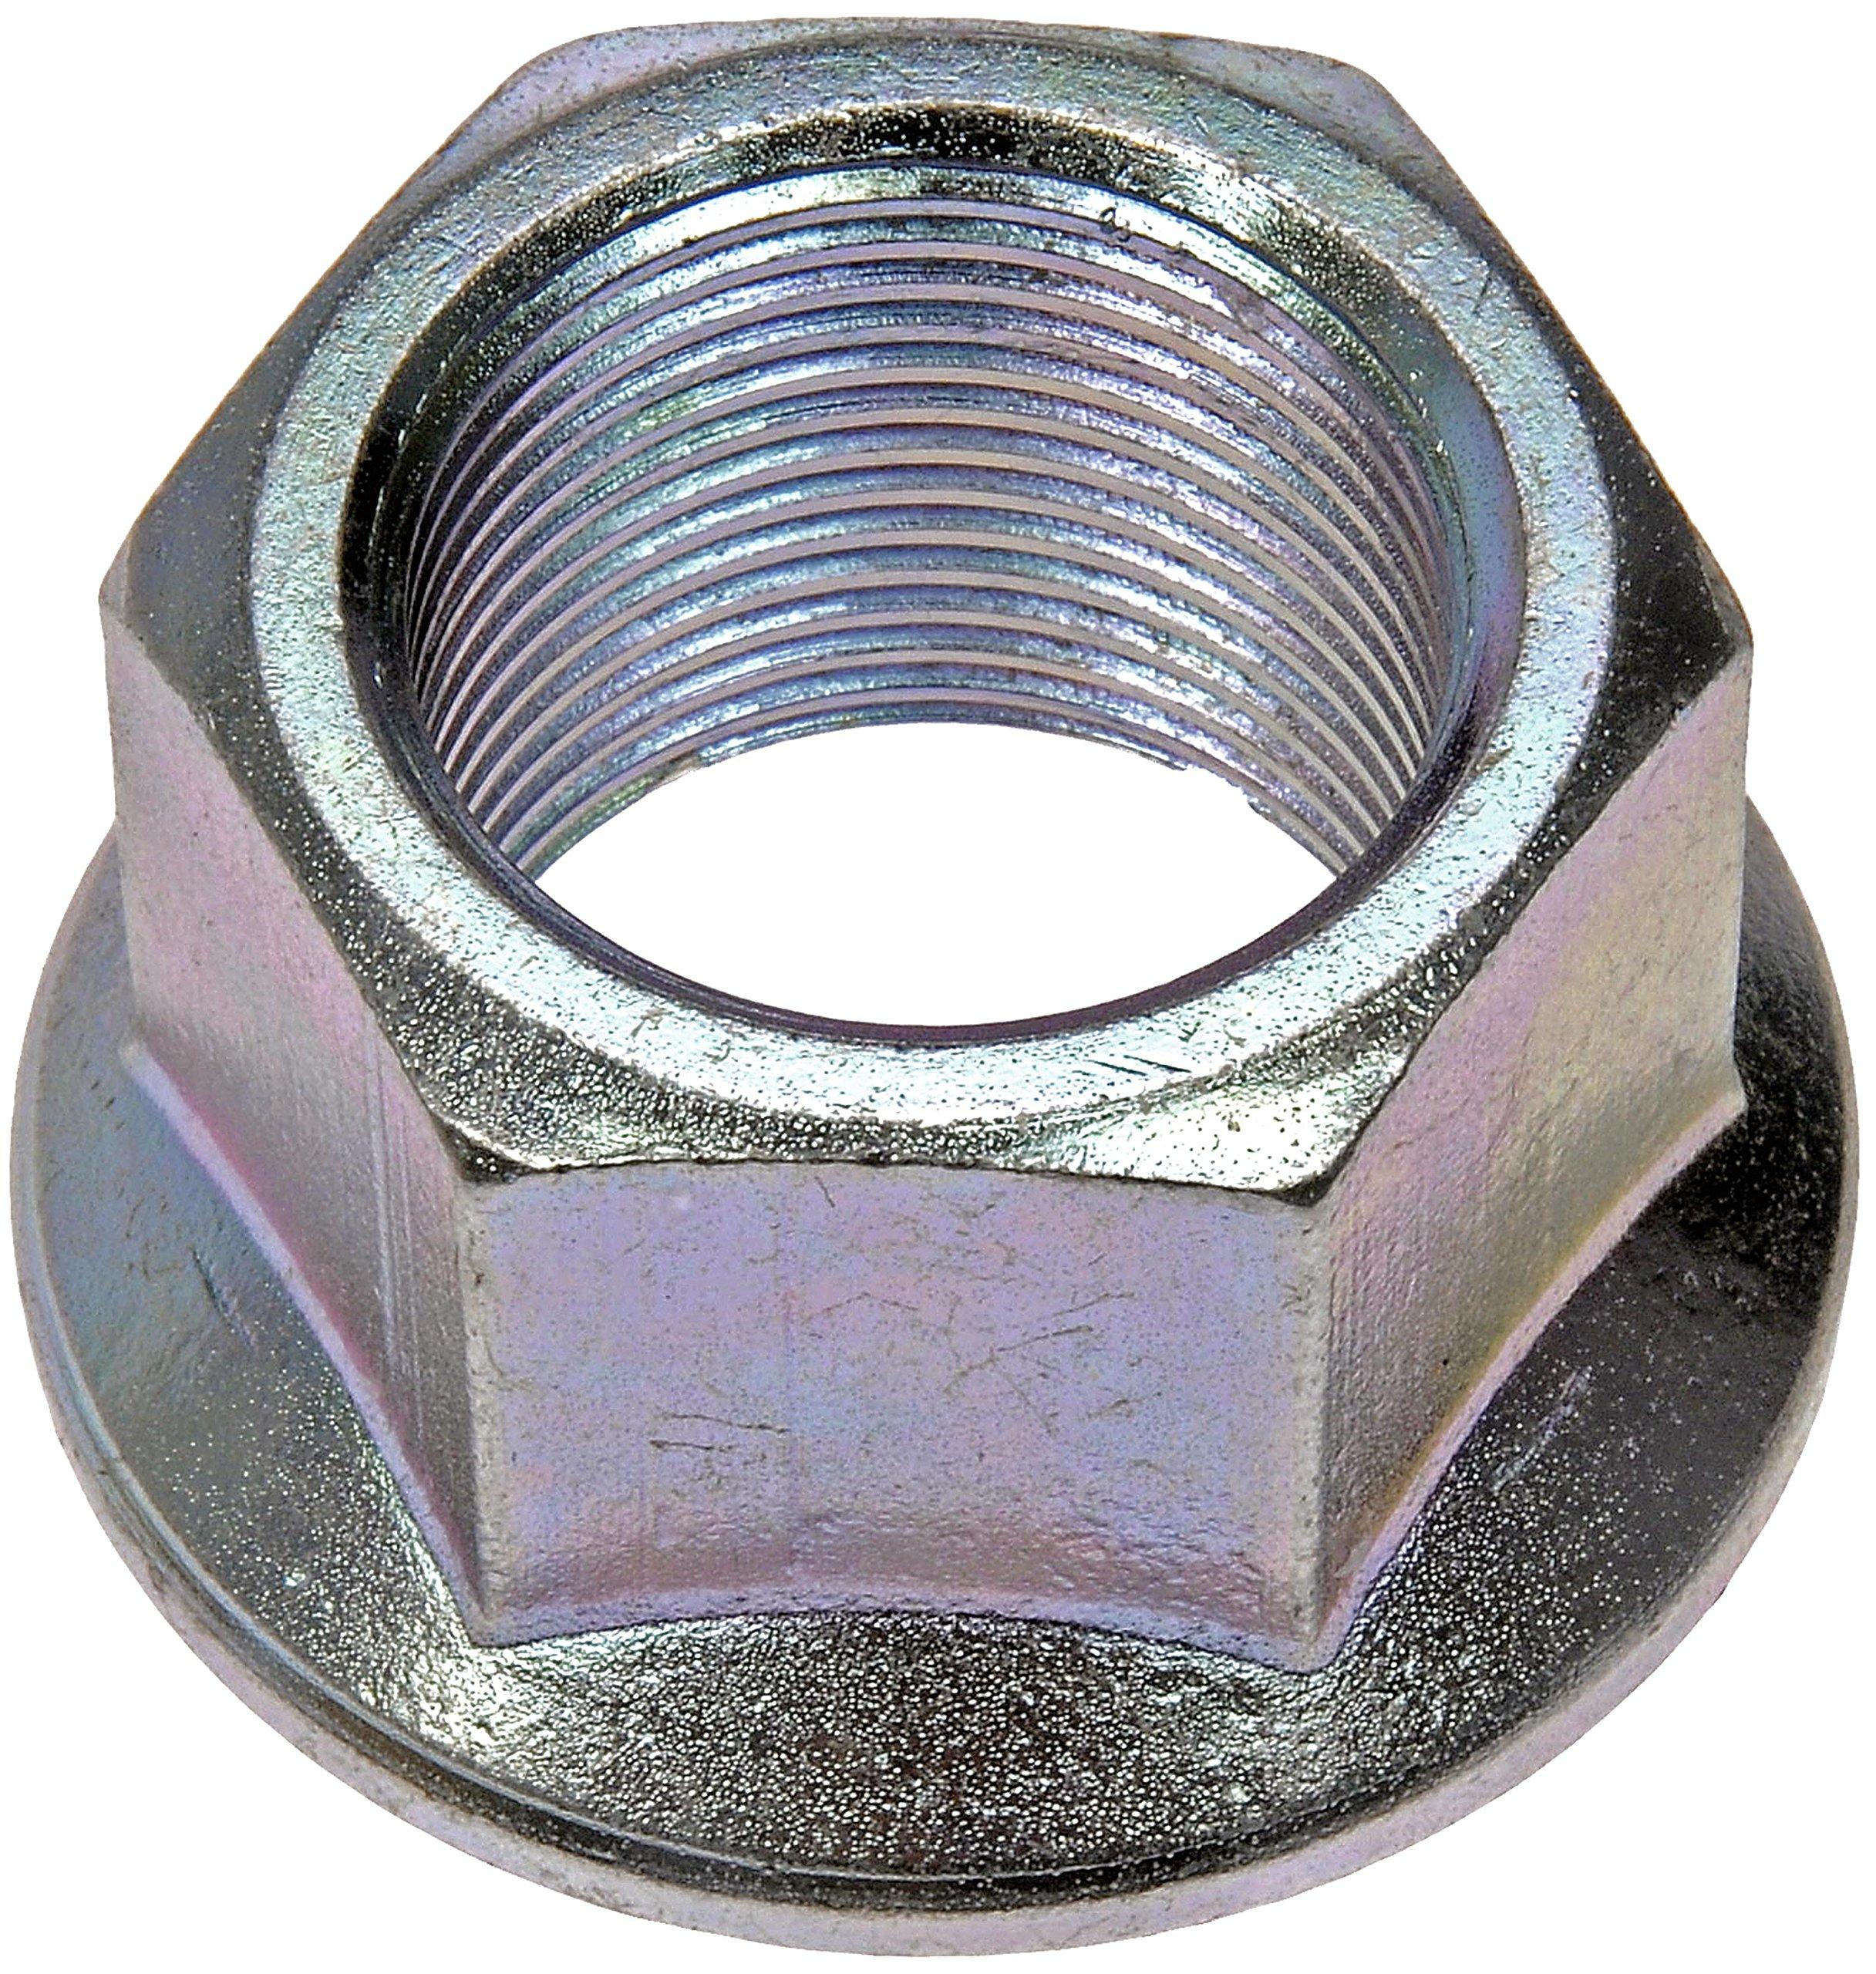 Dorman 615-223 M24-1.50 Hex 1-1/4'' Spindle Nut, Pack of 2